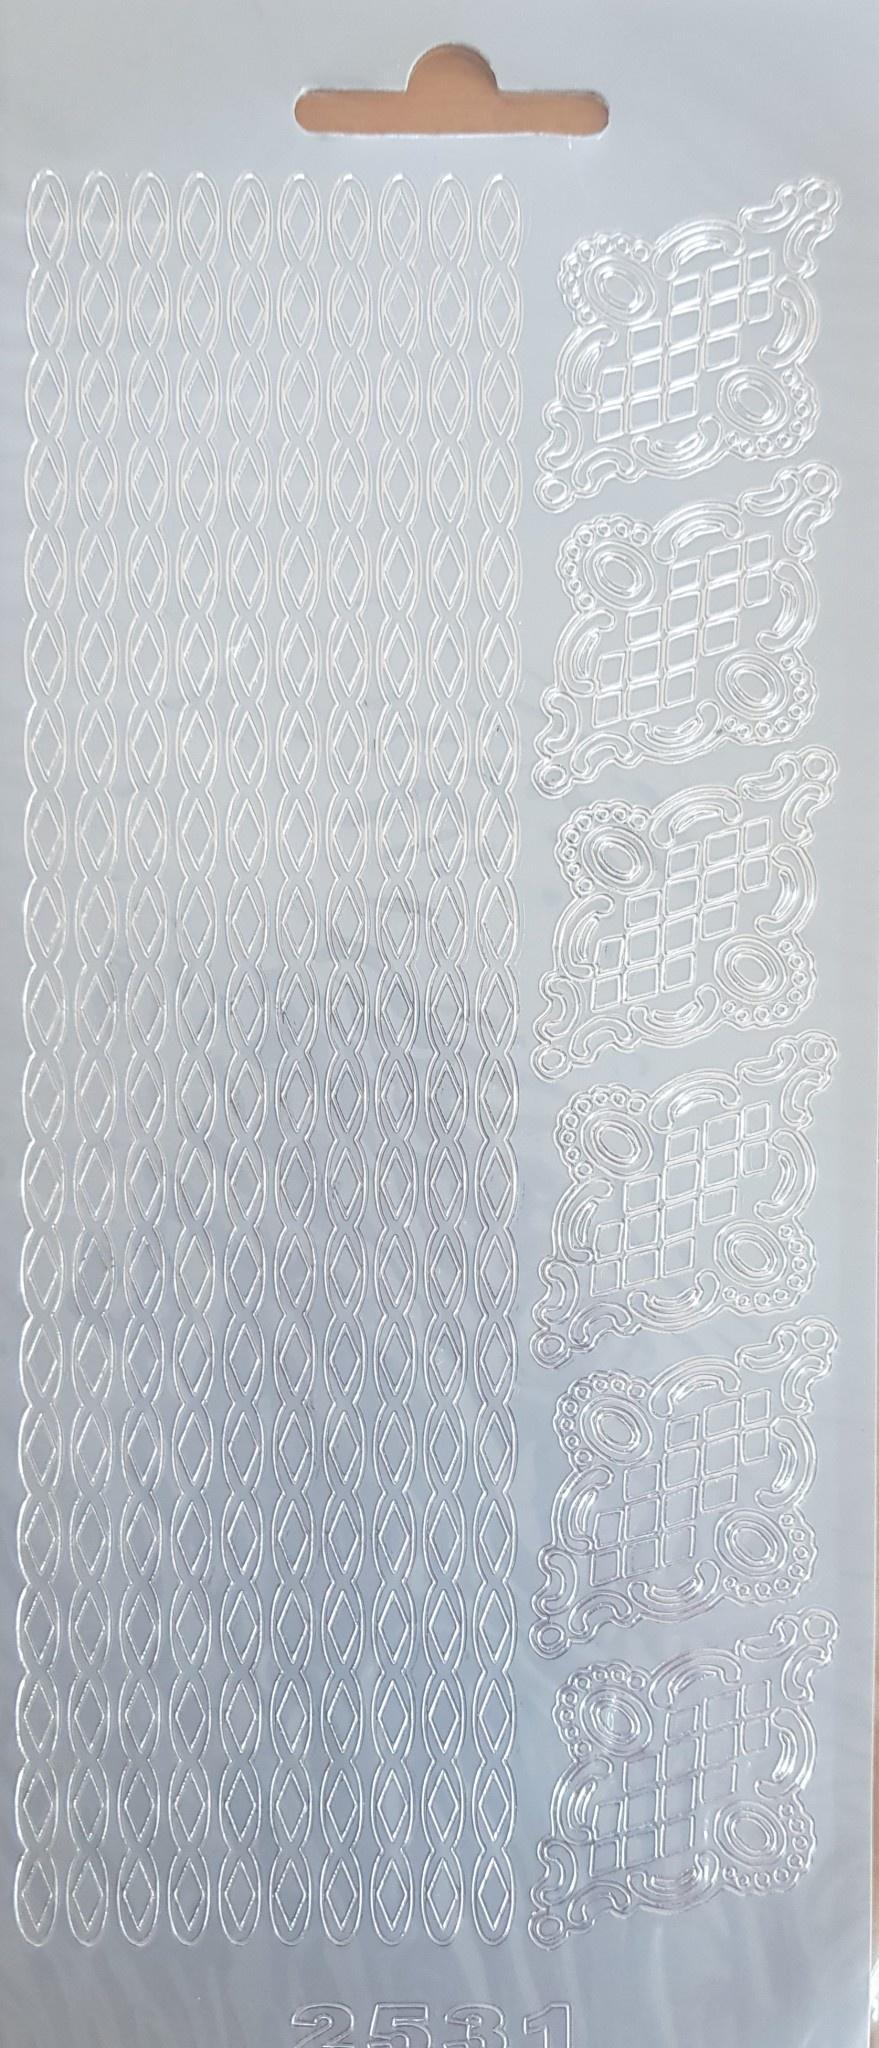 Stickervel randjes zilver rayher bordure (per vel)